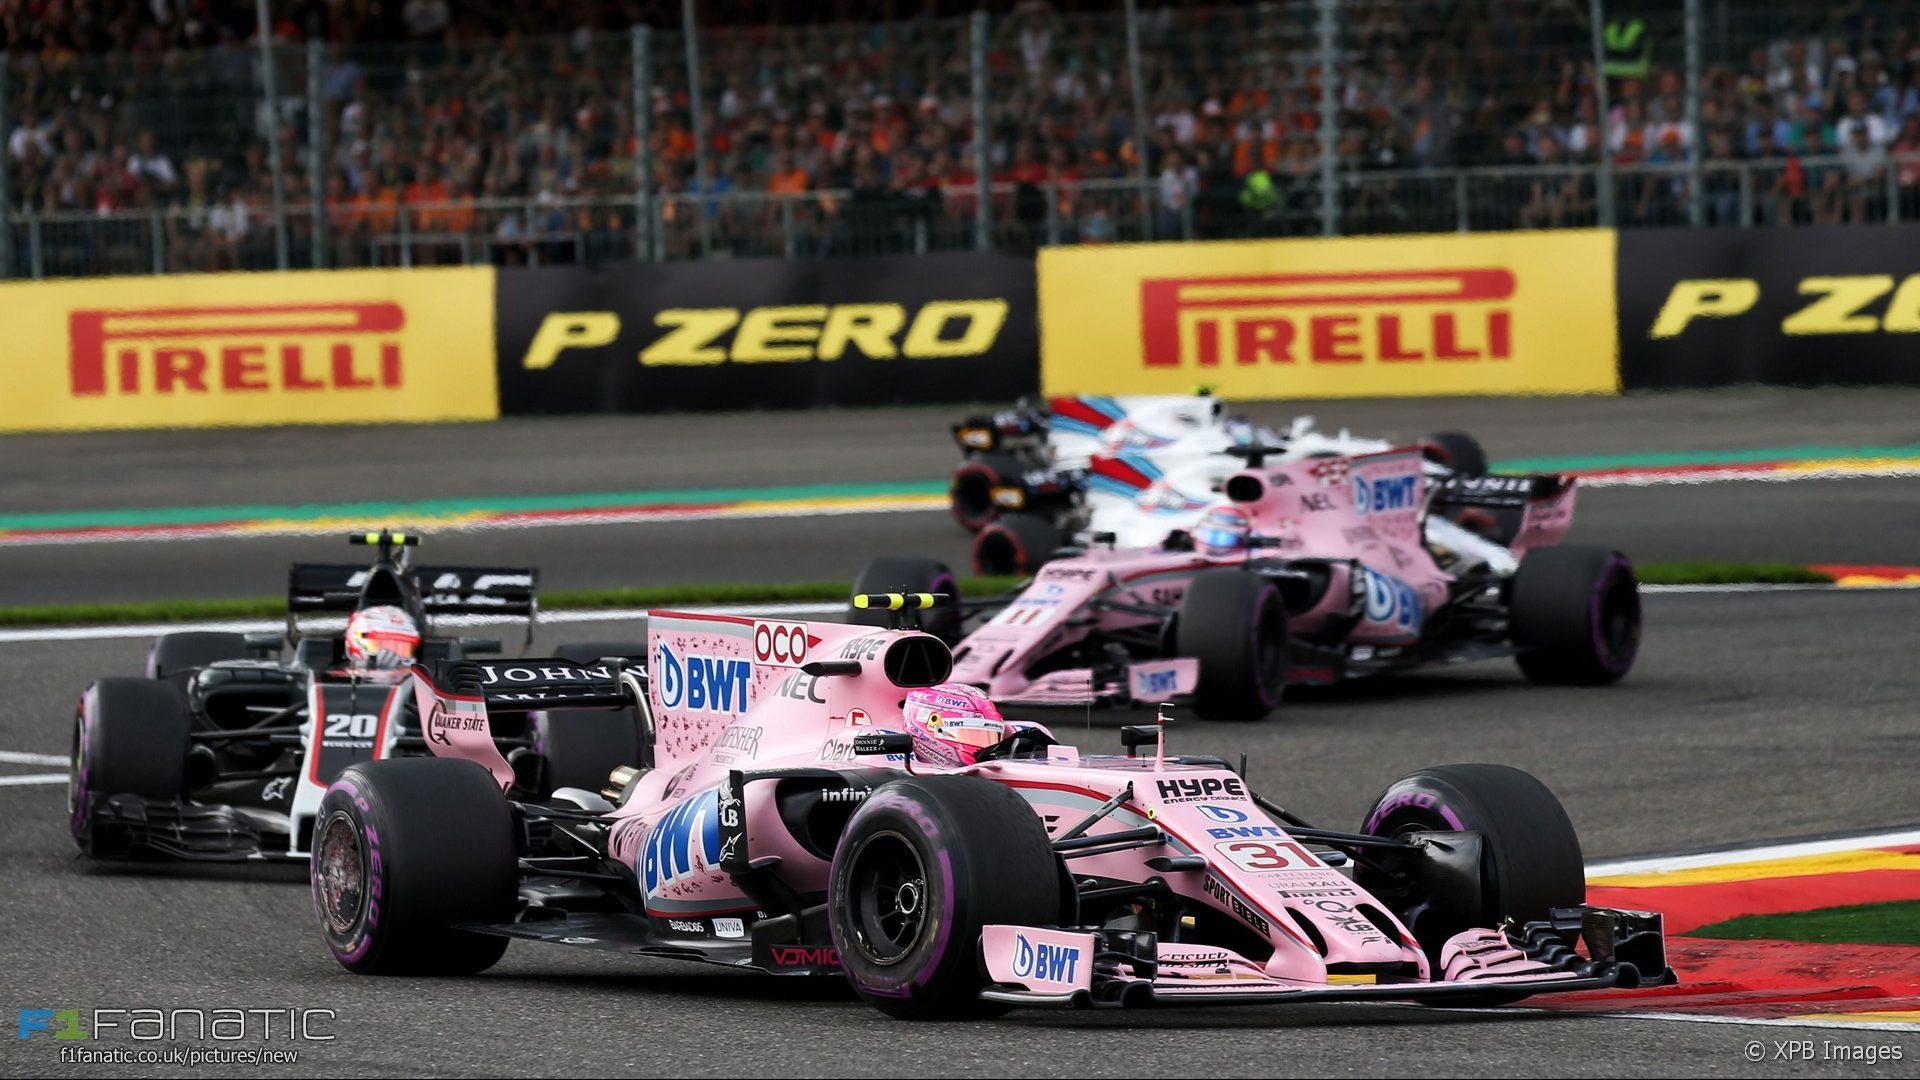 Esteban Ocon, Force India, Spa-Francorchamps, 2017